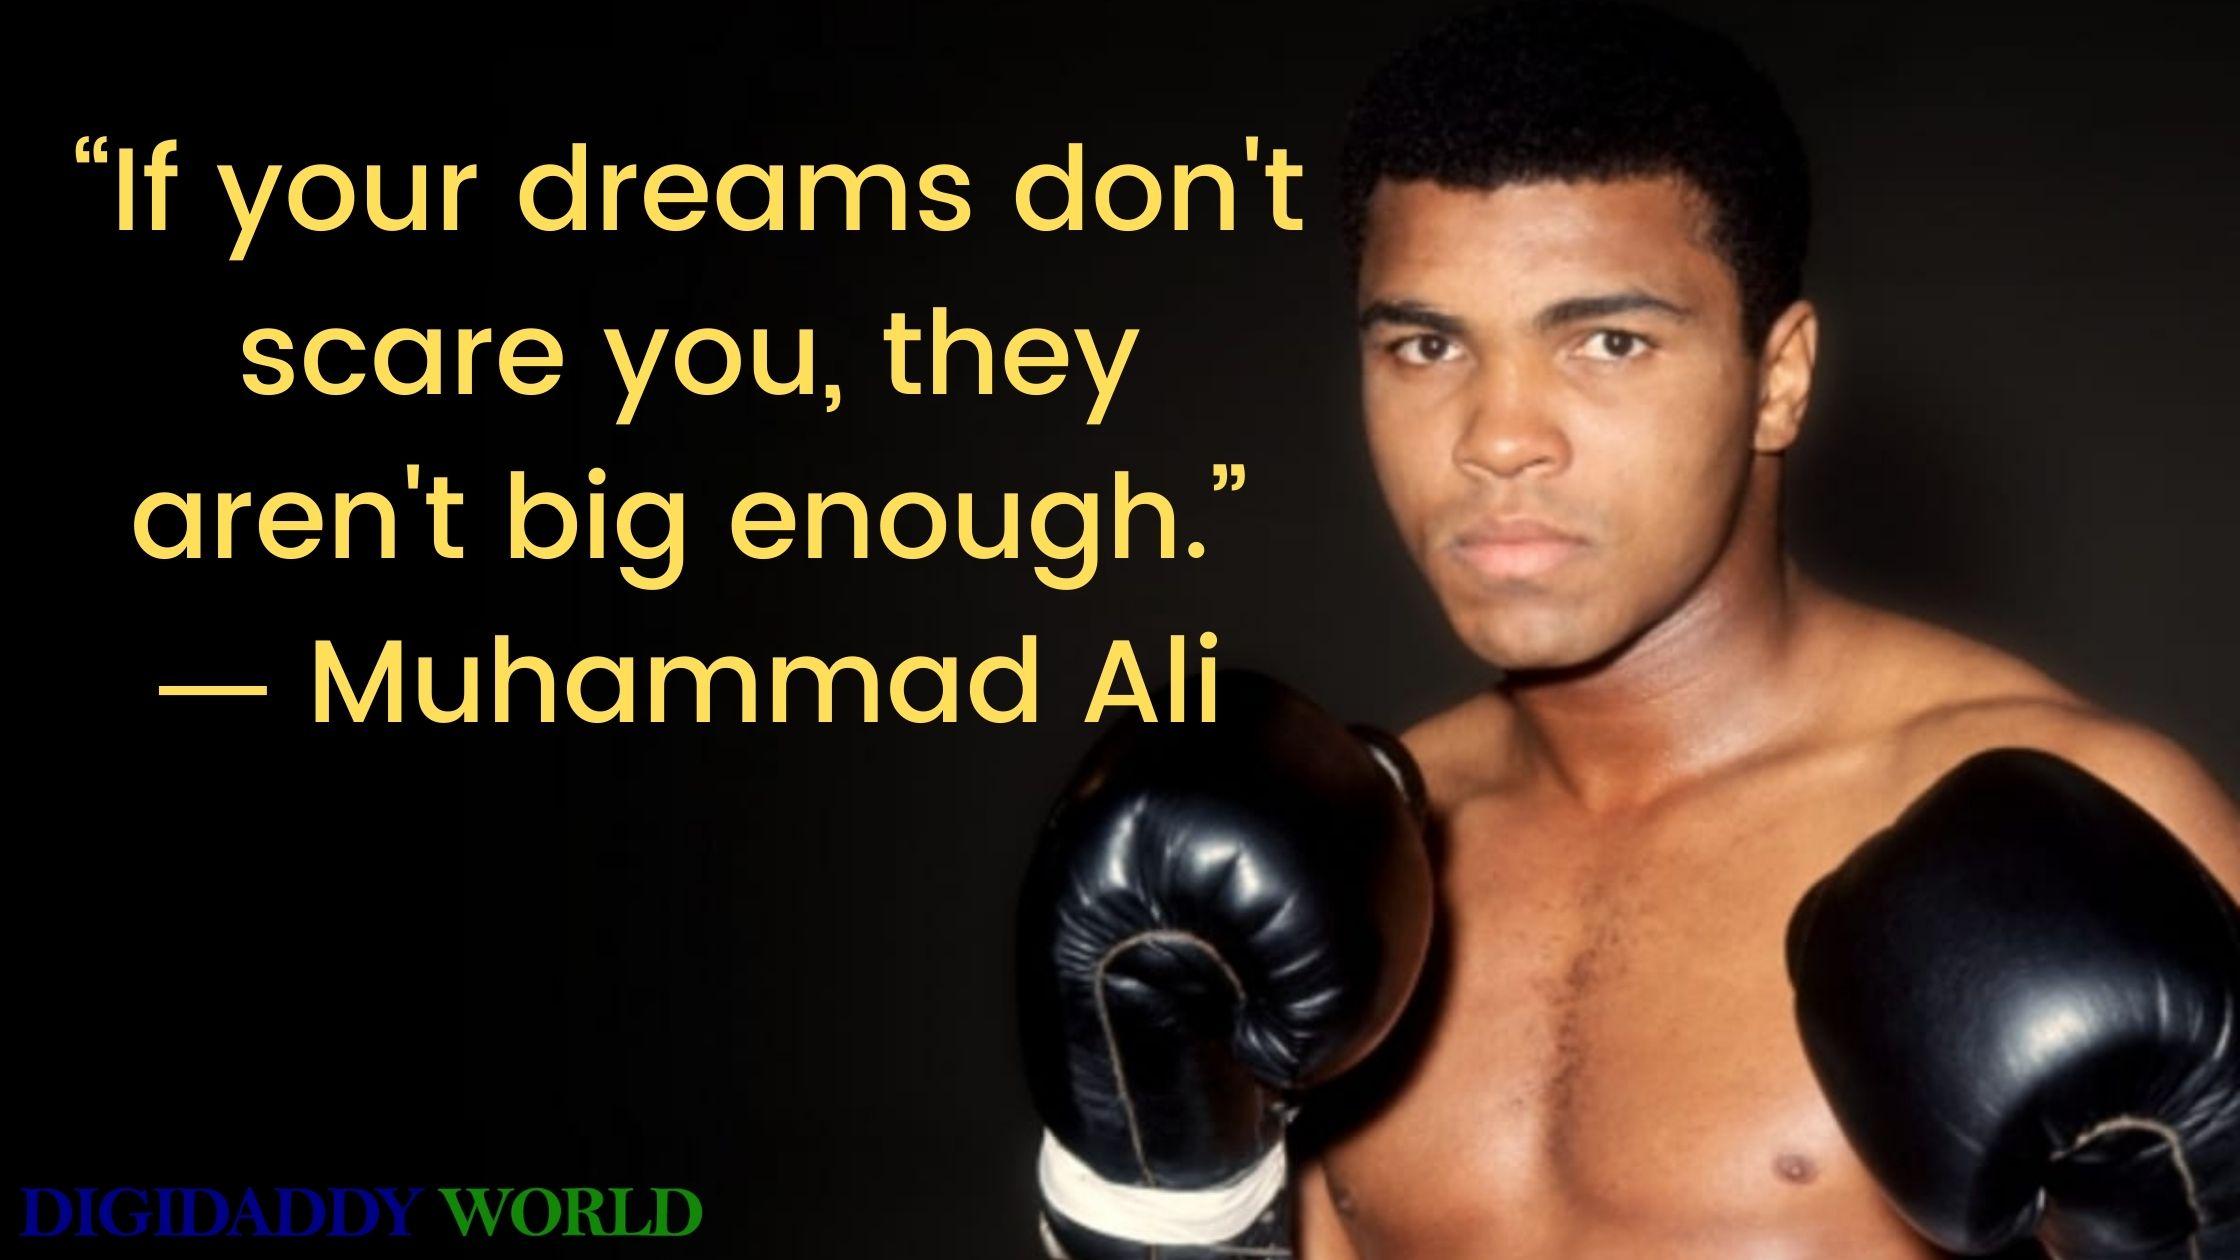 Muhammad Ali Motivational Quotes